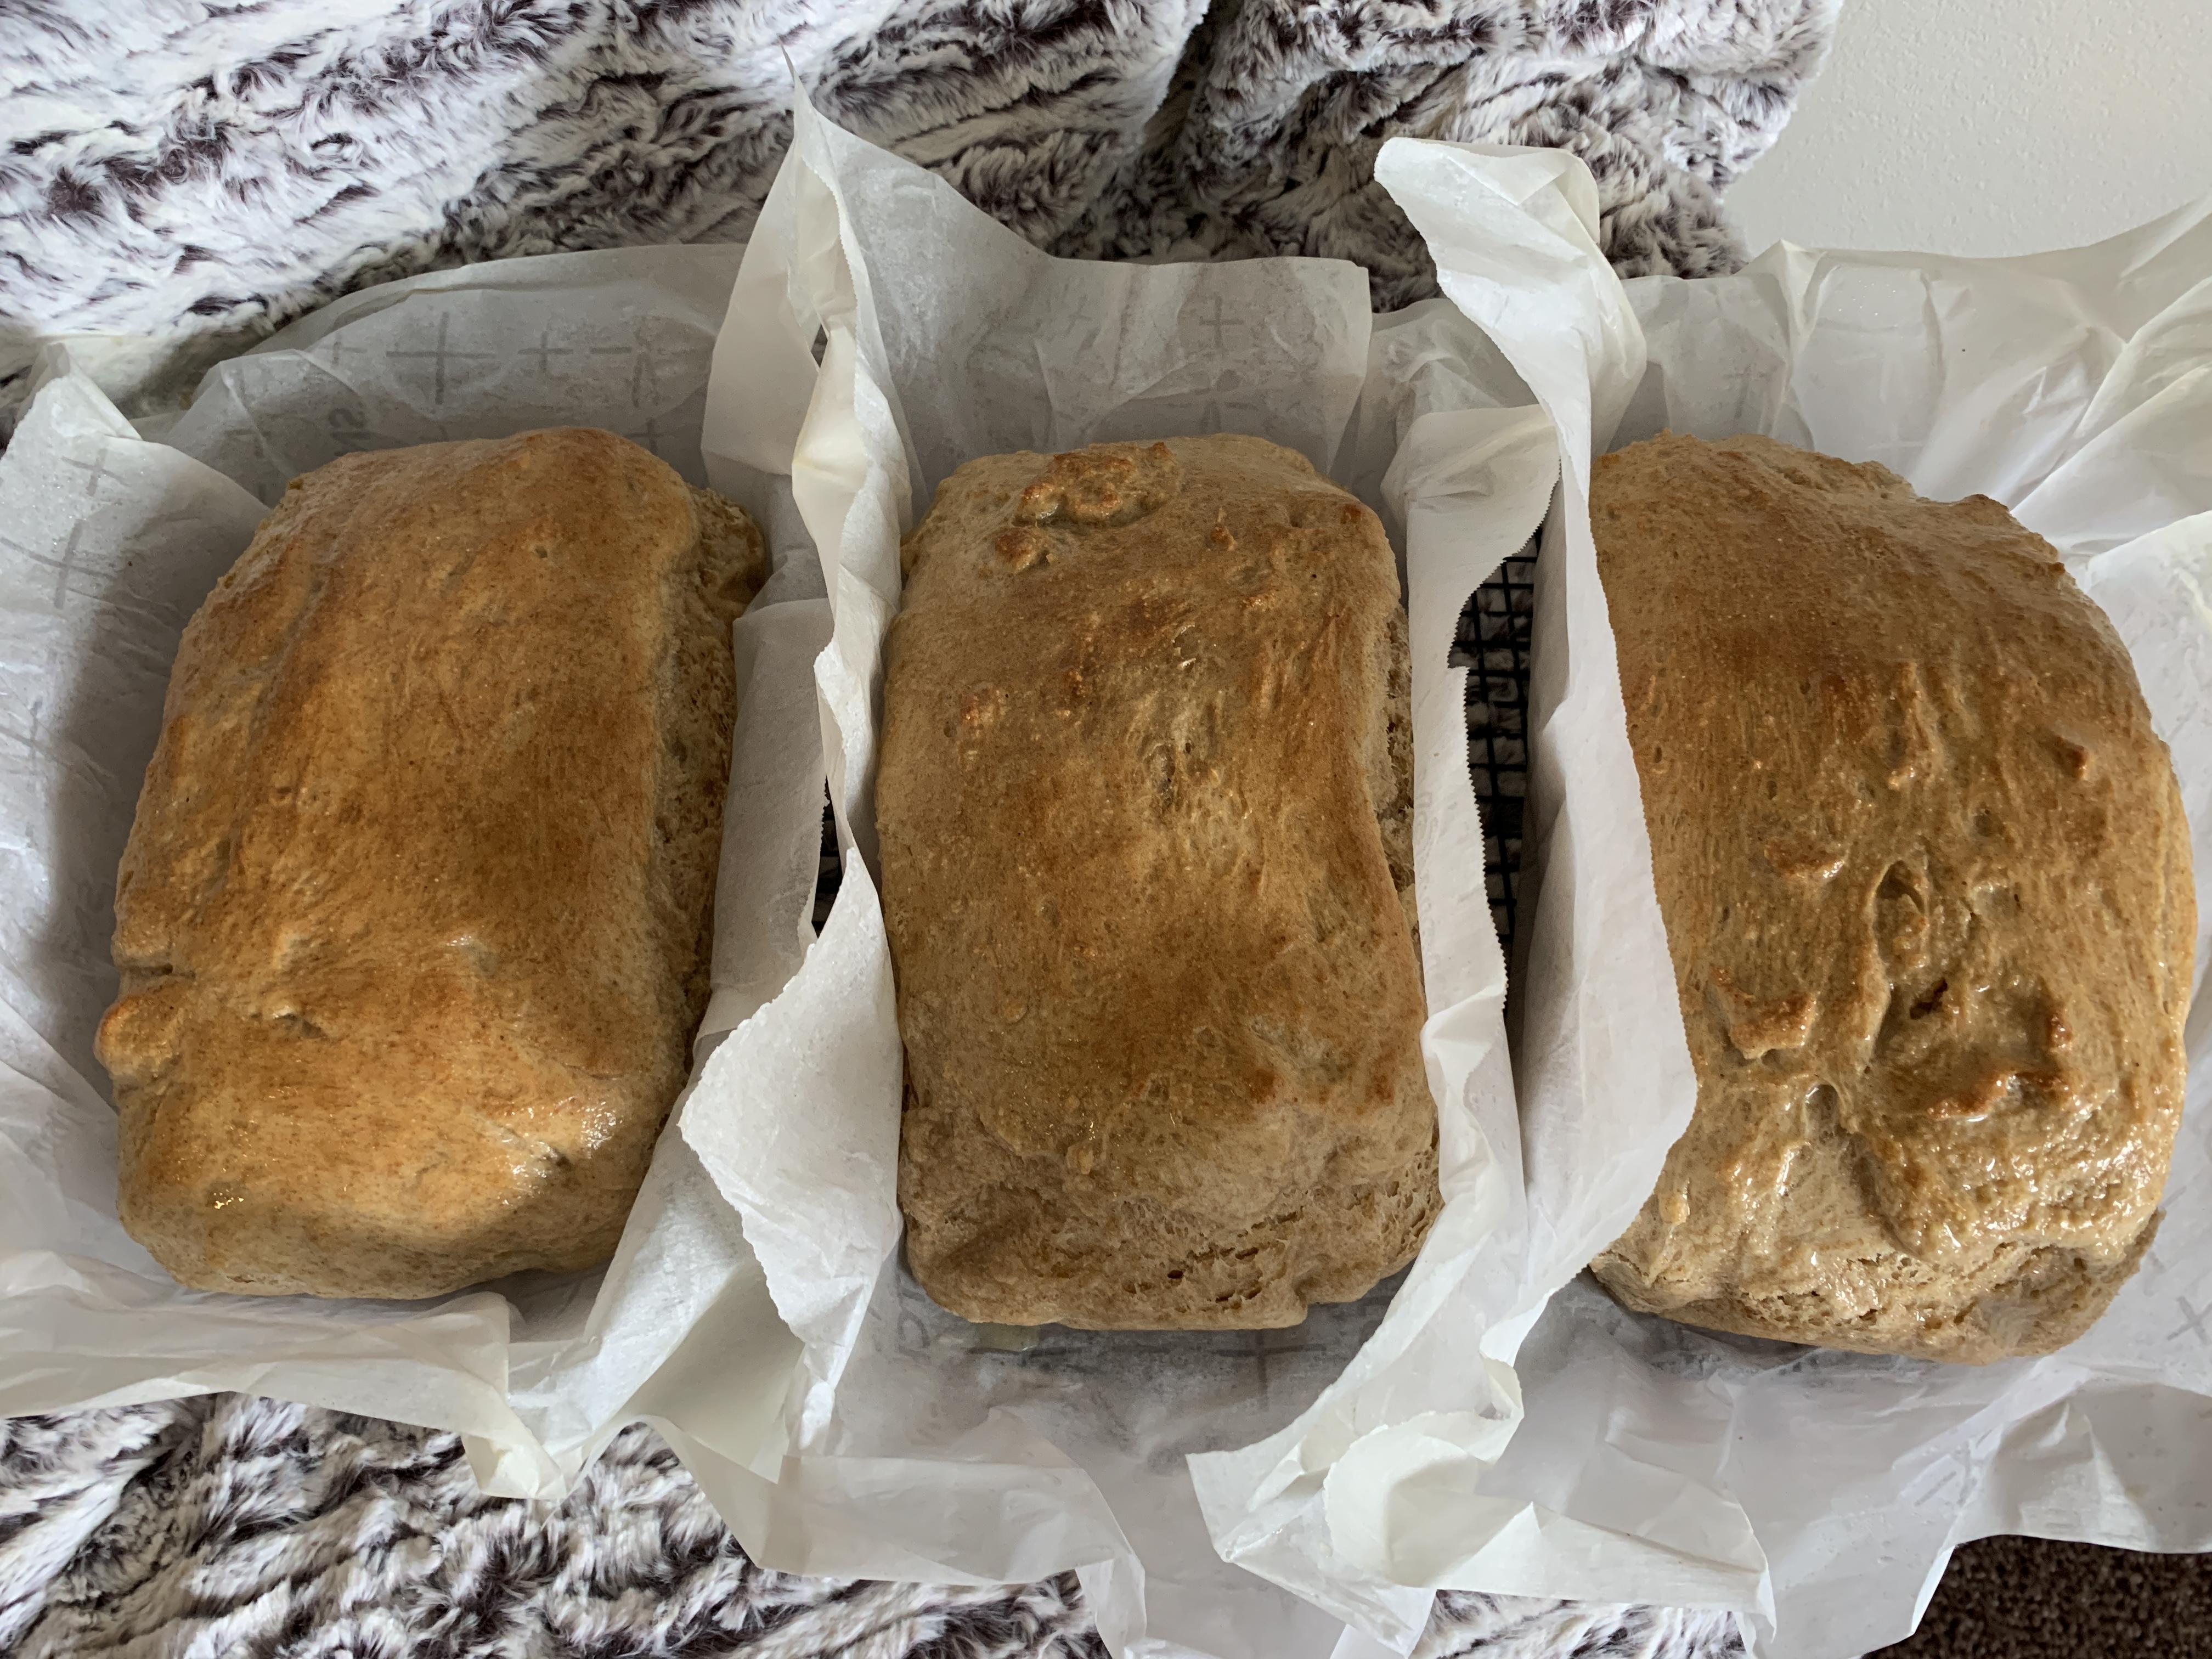 Easy 100% Whole Wheat Bread janapyle@msn.com